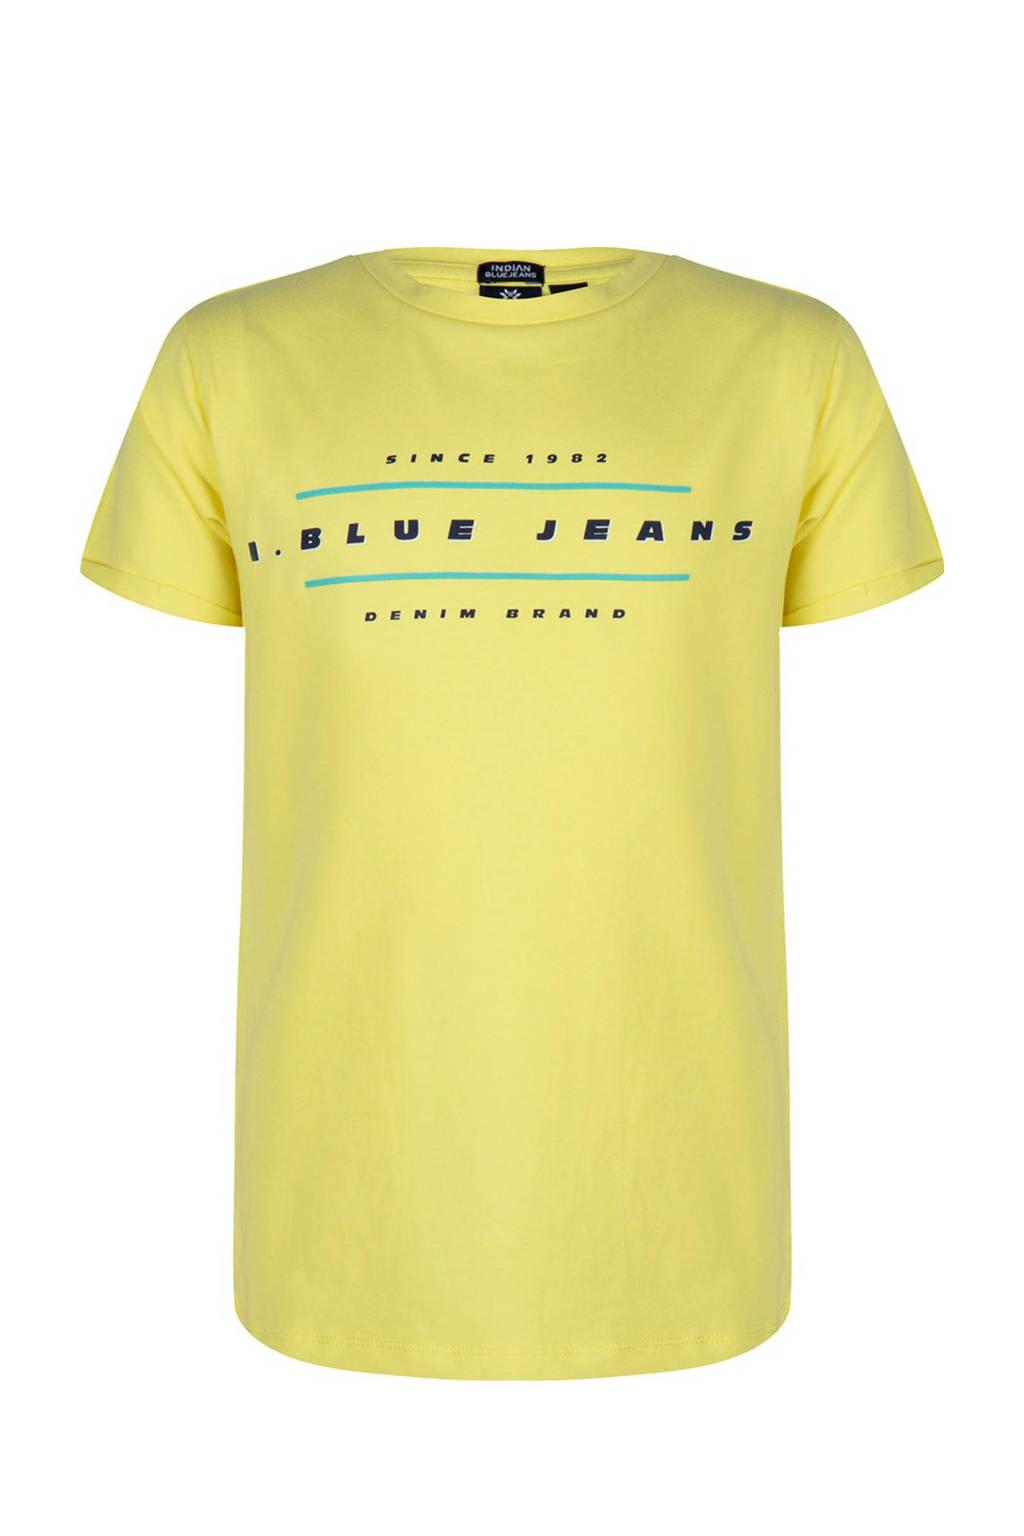 Indian Blue Jeans T-shirt met printopdruk zachtgeel, Zachtgeel